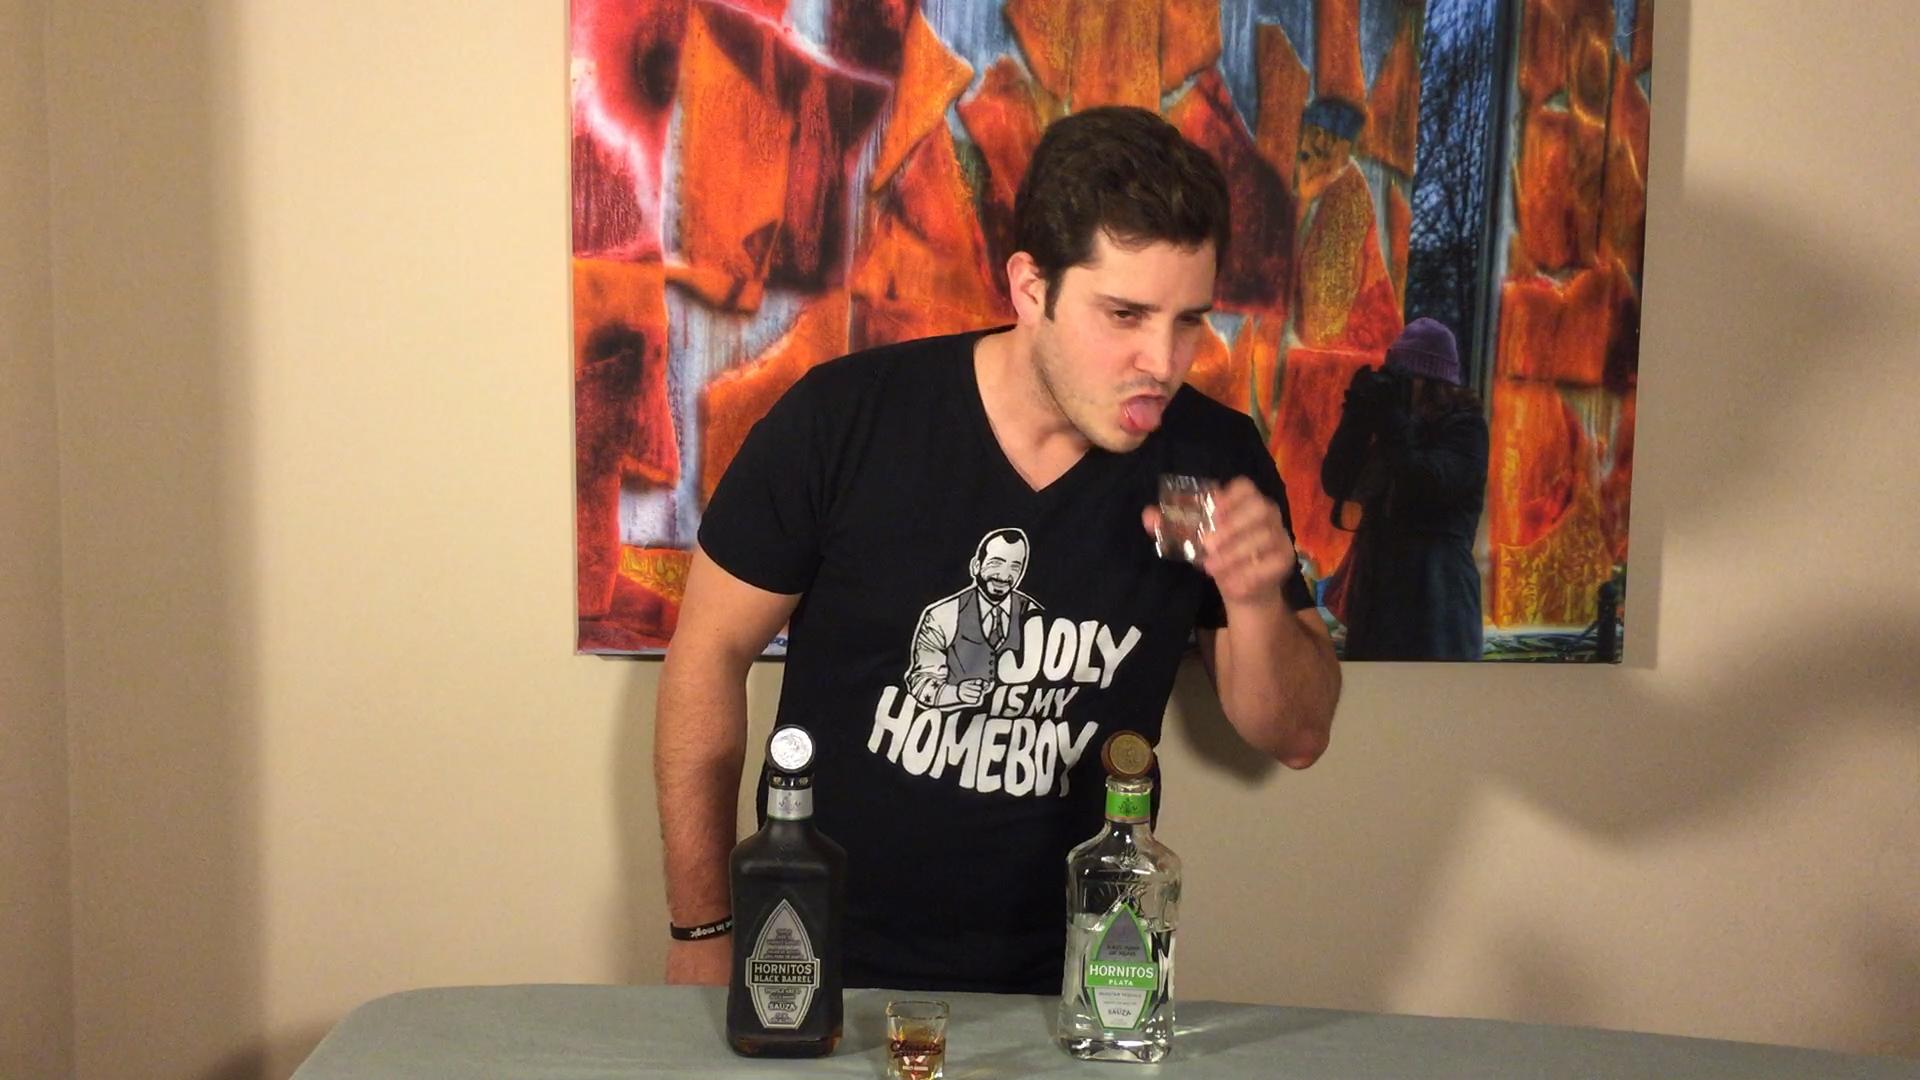 Tequila boozist